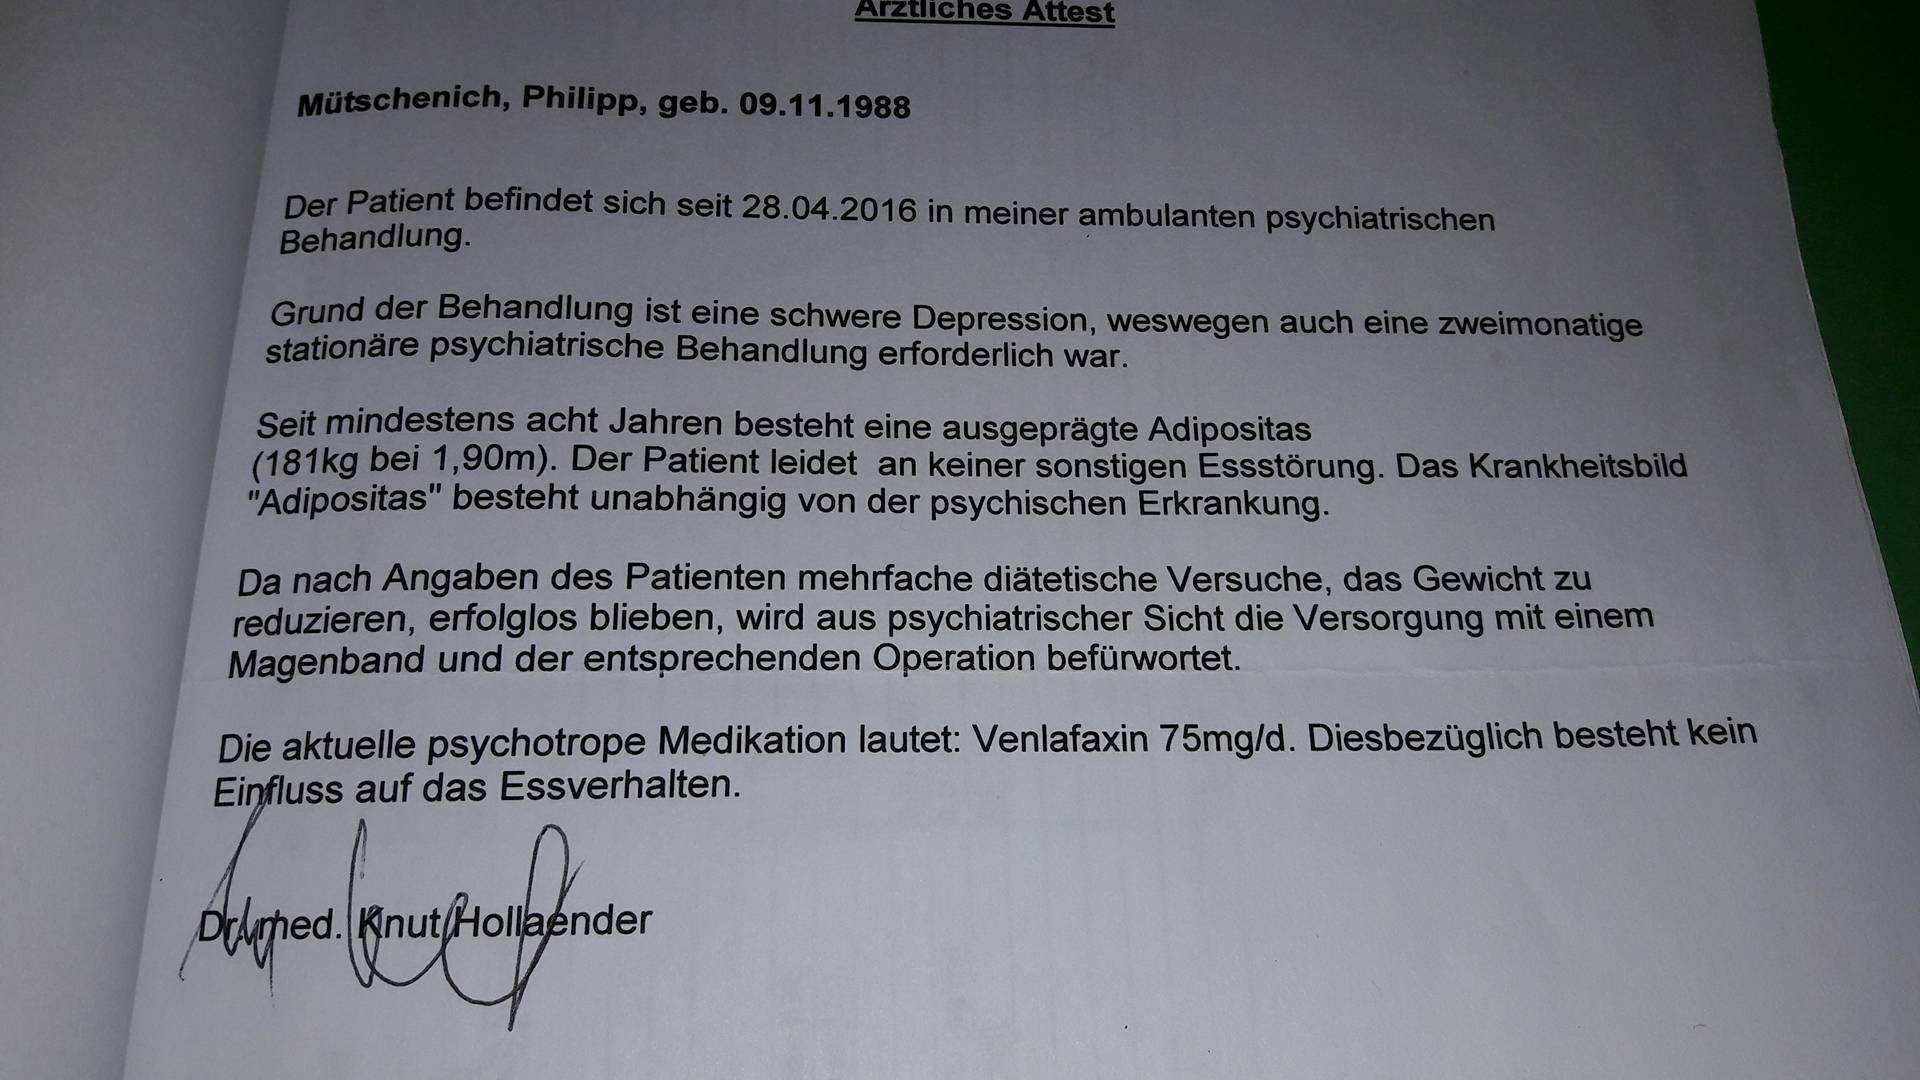 Psychologisches Gutachten Allgemeines Adipositas24 Community